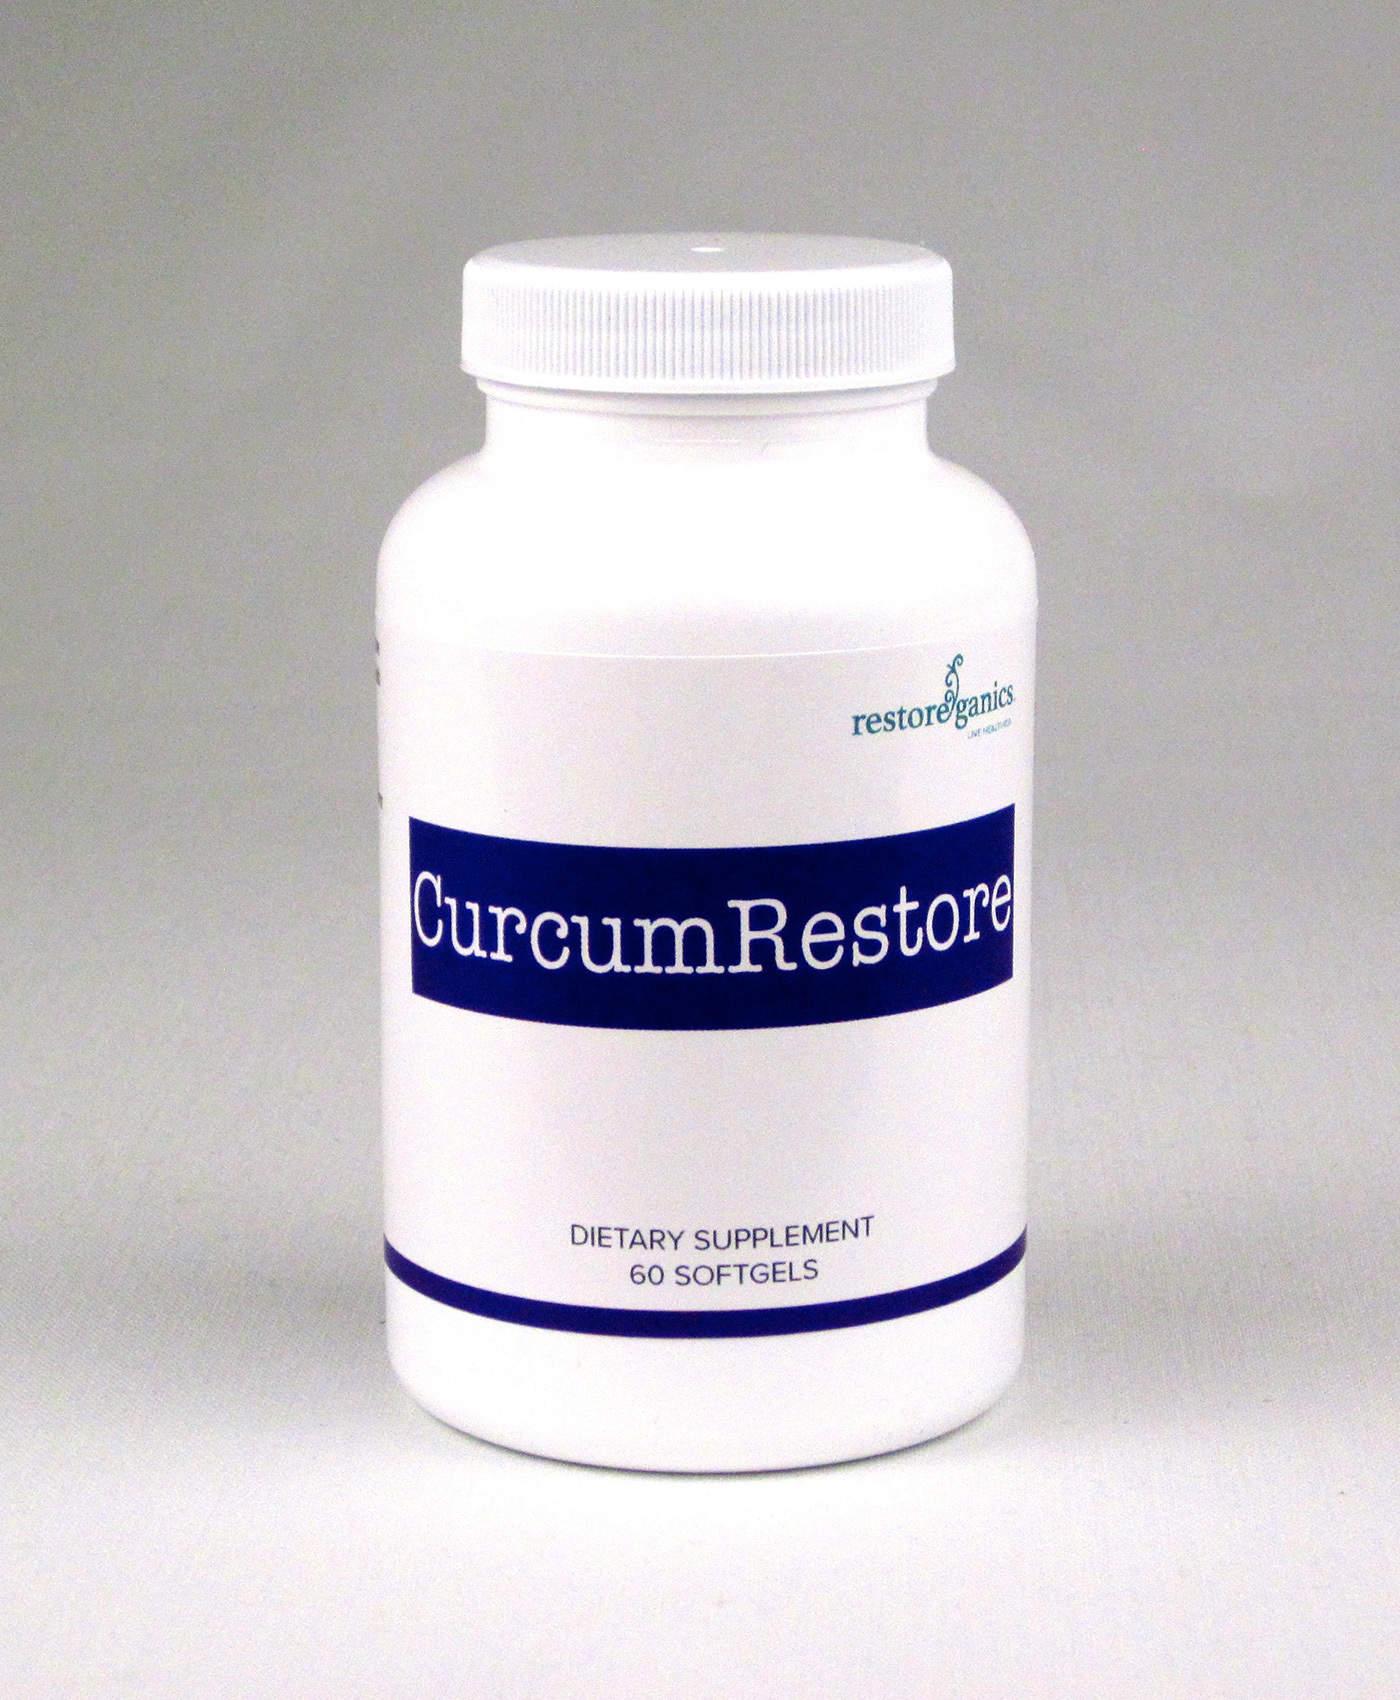 Curcum Restore